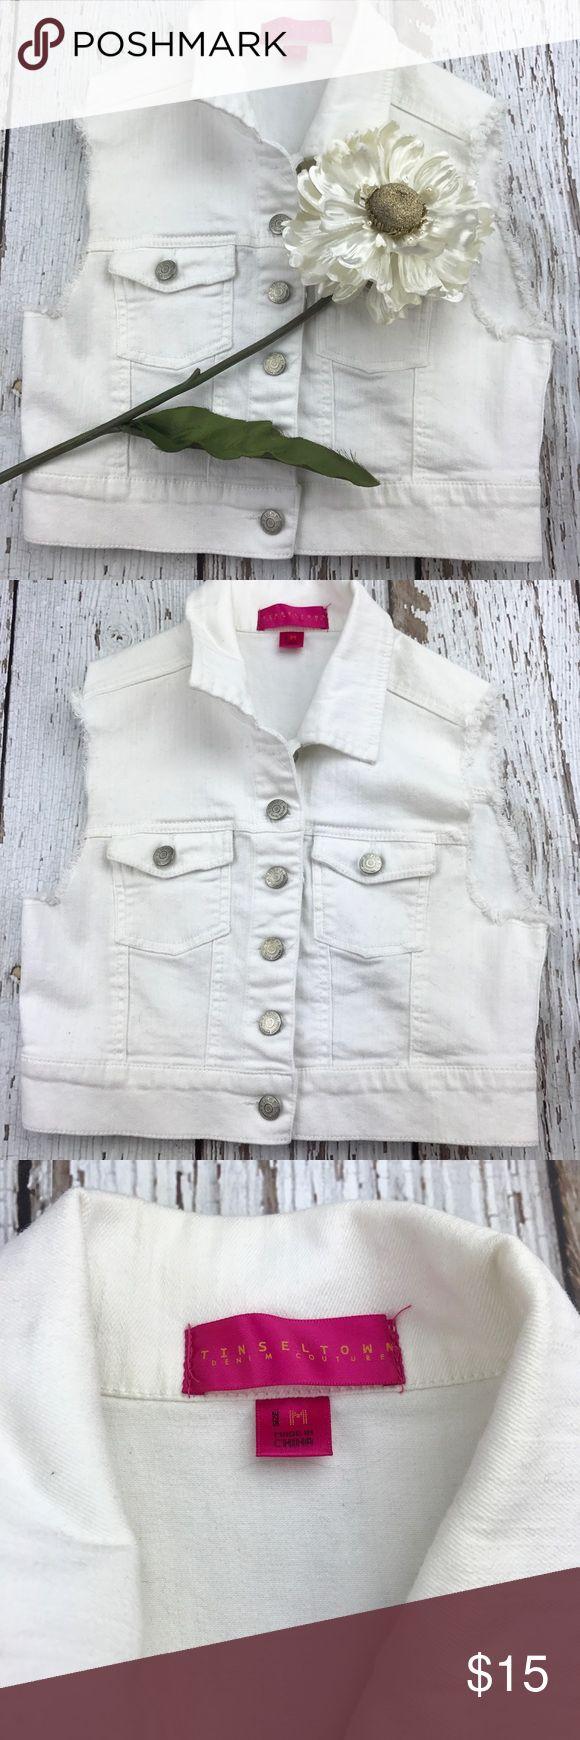 "💕SALE💕White Denim Vest Fabulous 💕SALE💕White Denim Vest 15"" from the top of the shoulder to the bottom 15 1/2"" Inseam armpit to armpit 98% Cotton 2% Spandex Jackets & Coats Vests"